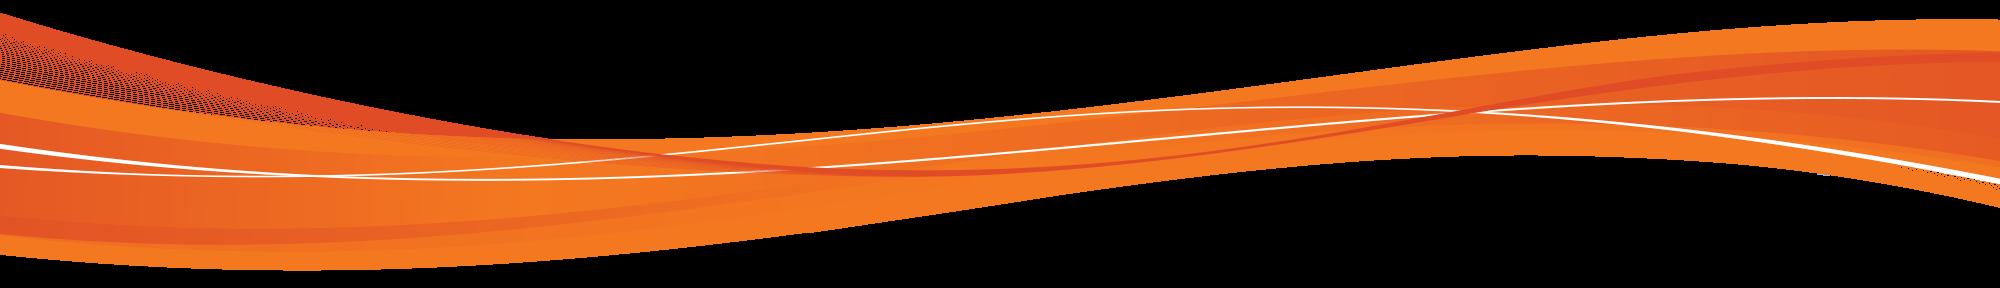 orange-wave-insametal